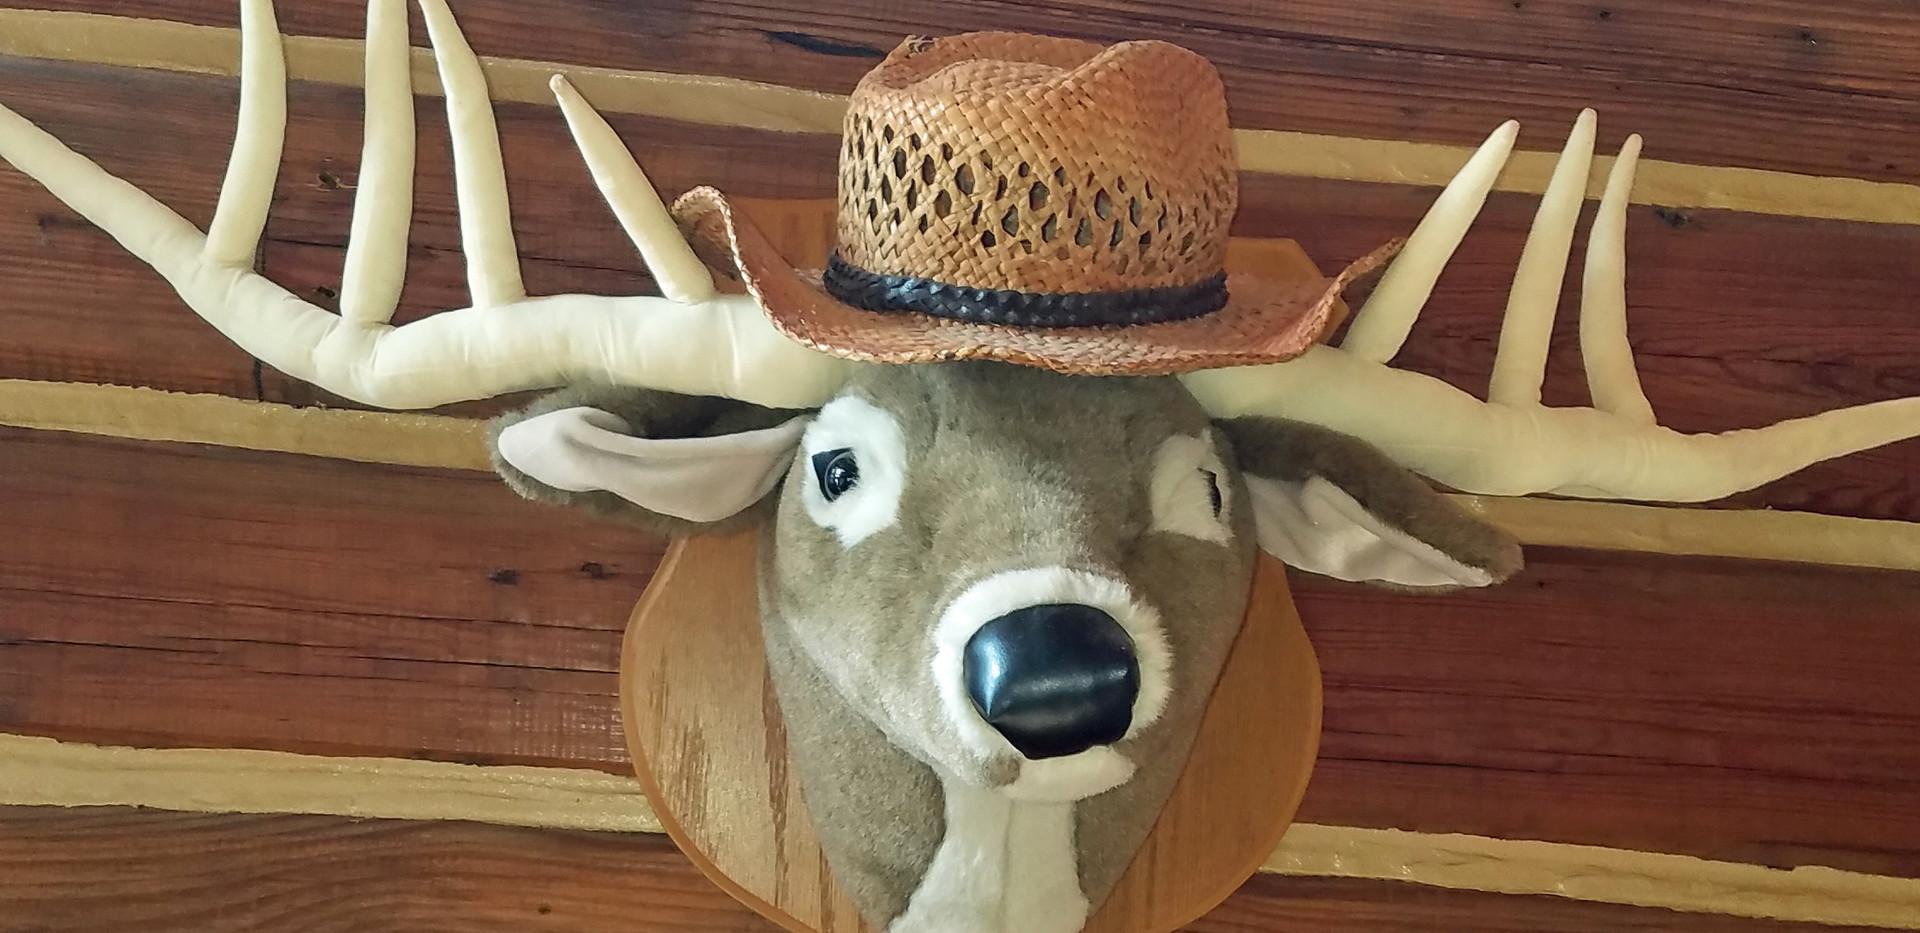 Our cabin mascot